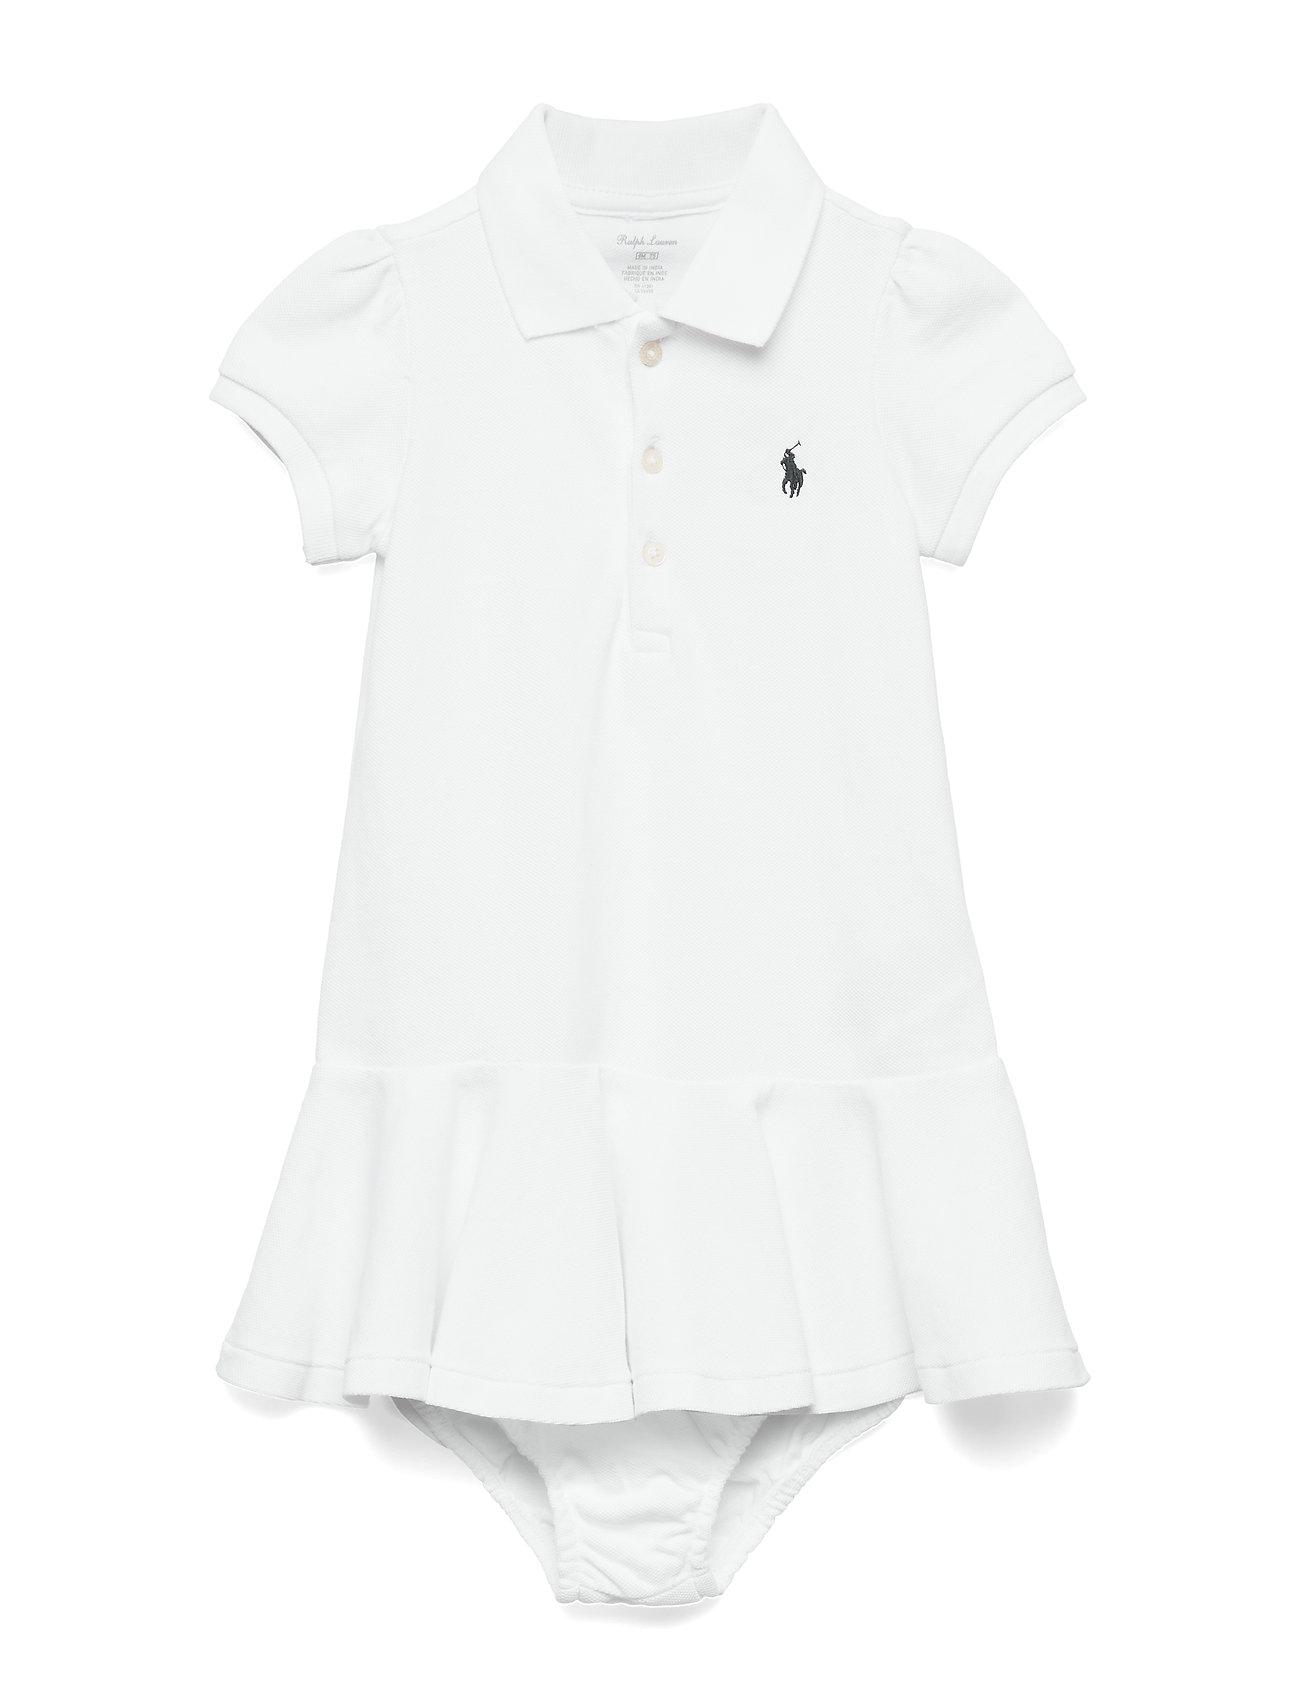 Ralph Lauren Baby Piqué Polo Dress & Bloomer - WHITE